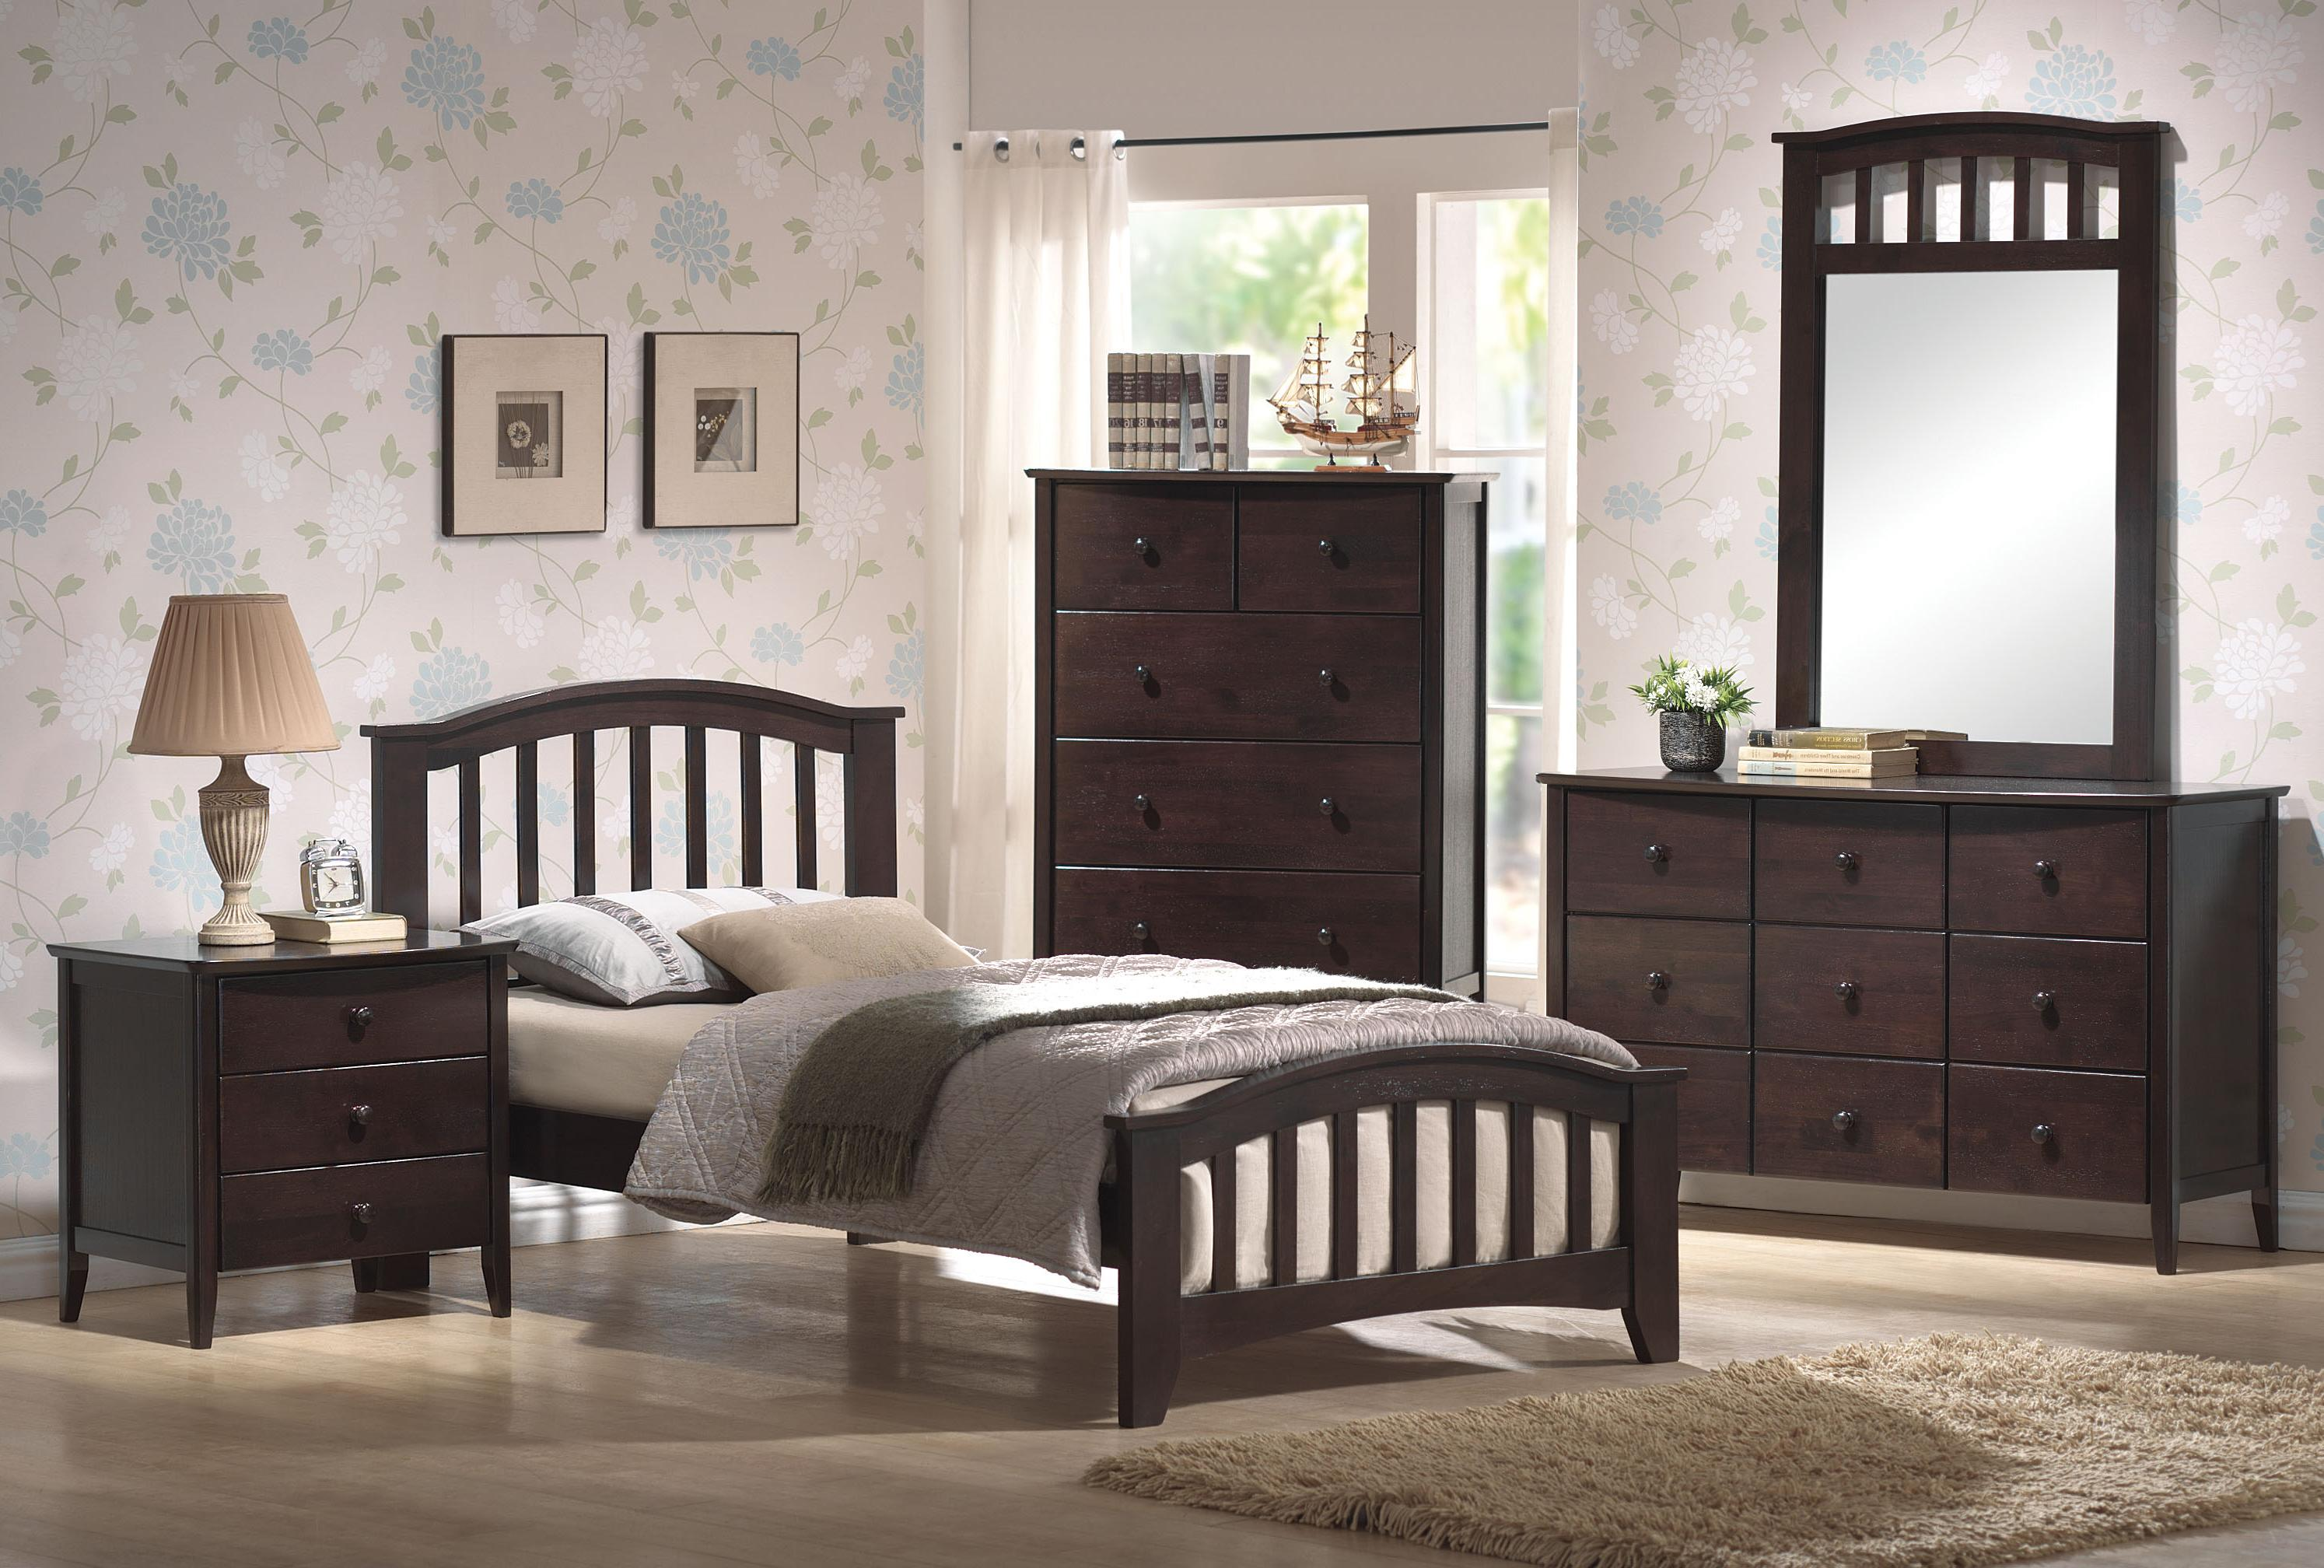 San Marino (49) by Acme Furniture - Furniture Superstore - NM ...